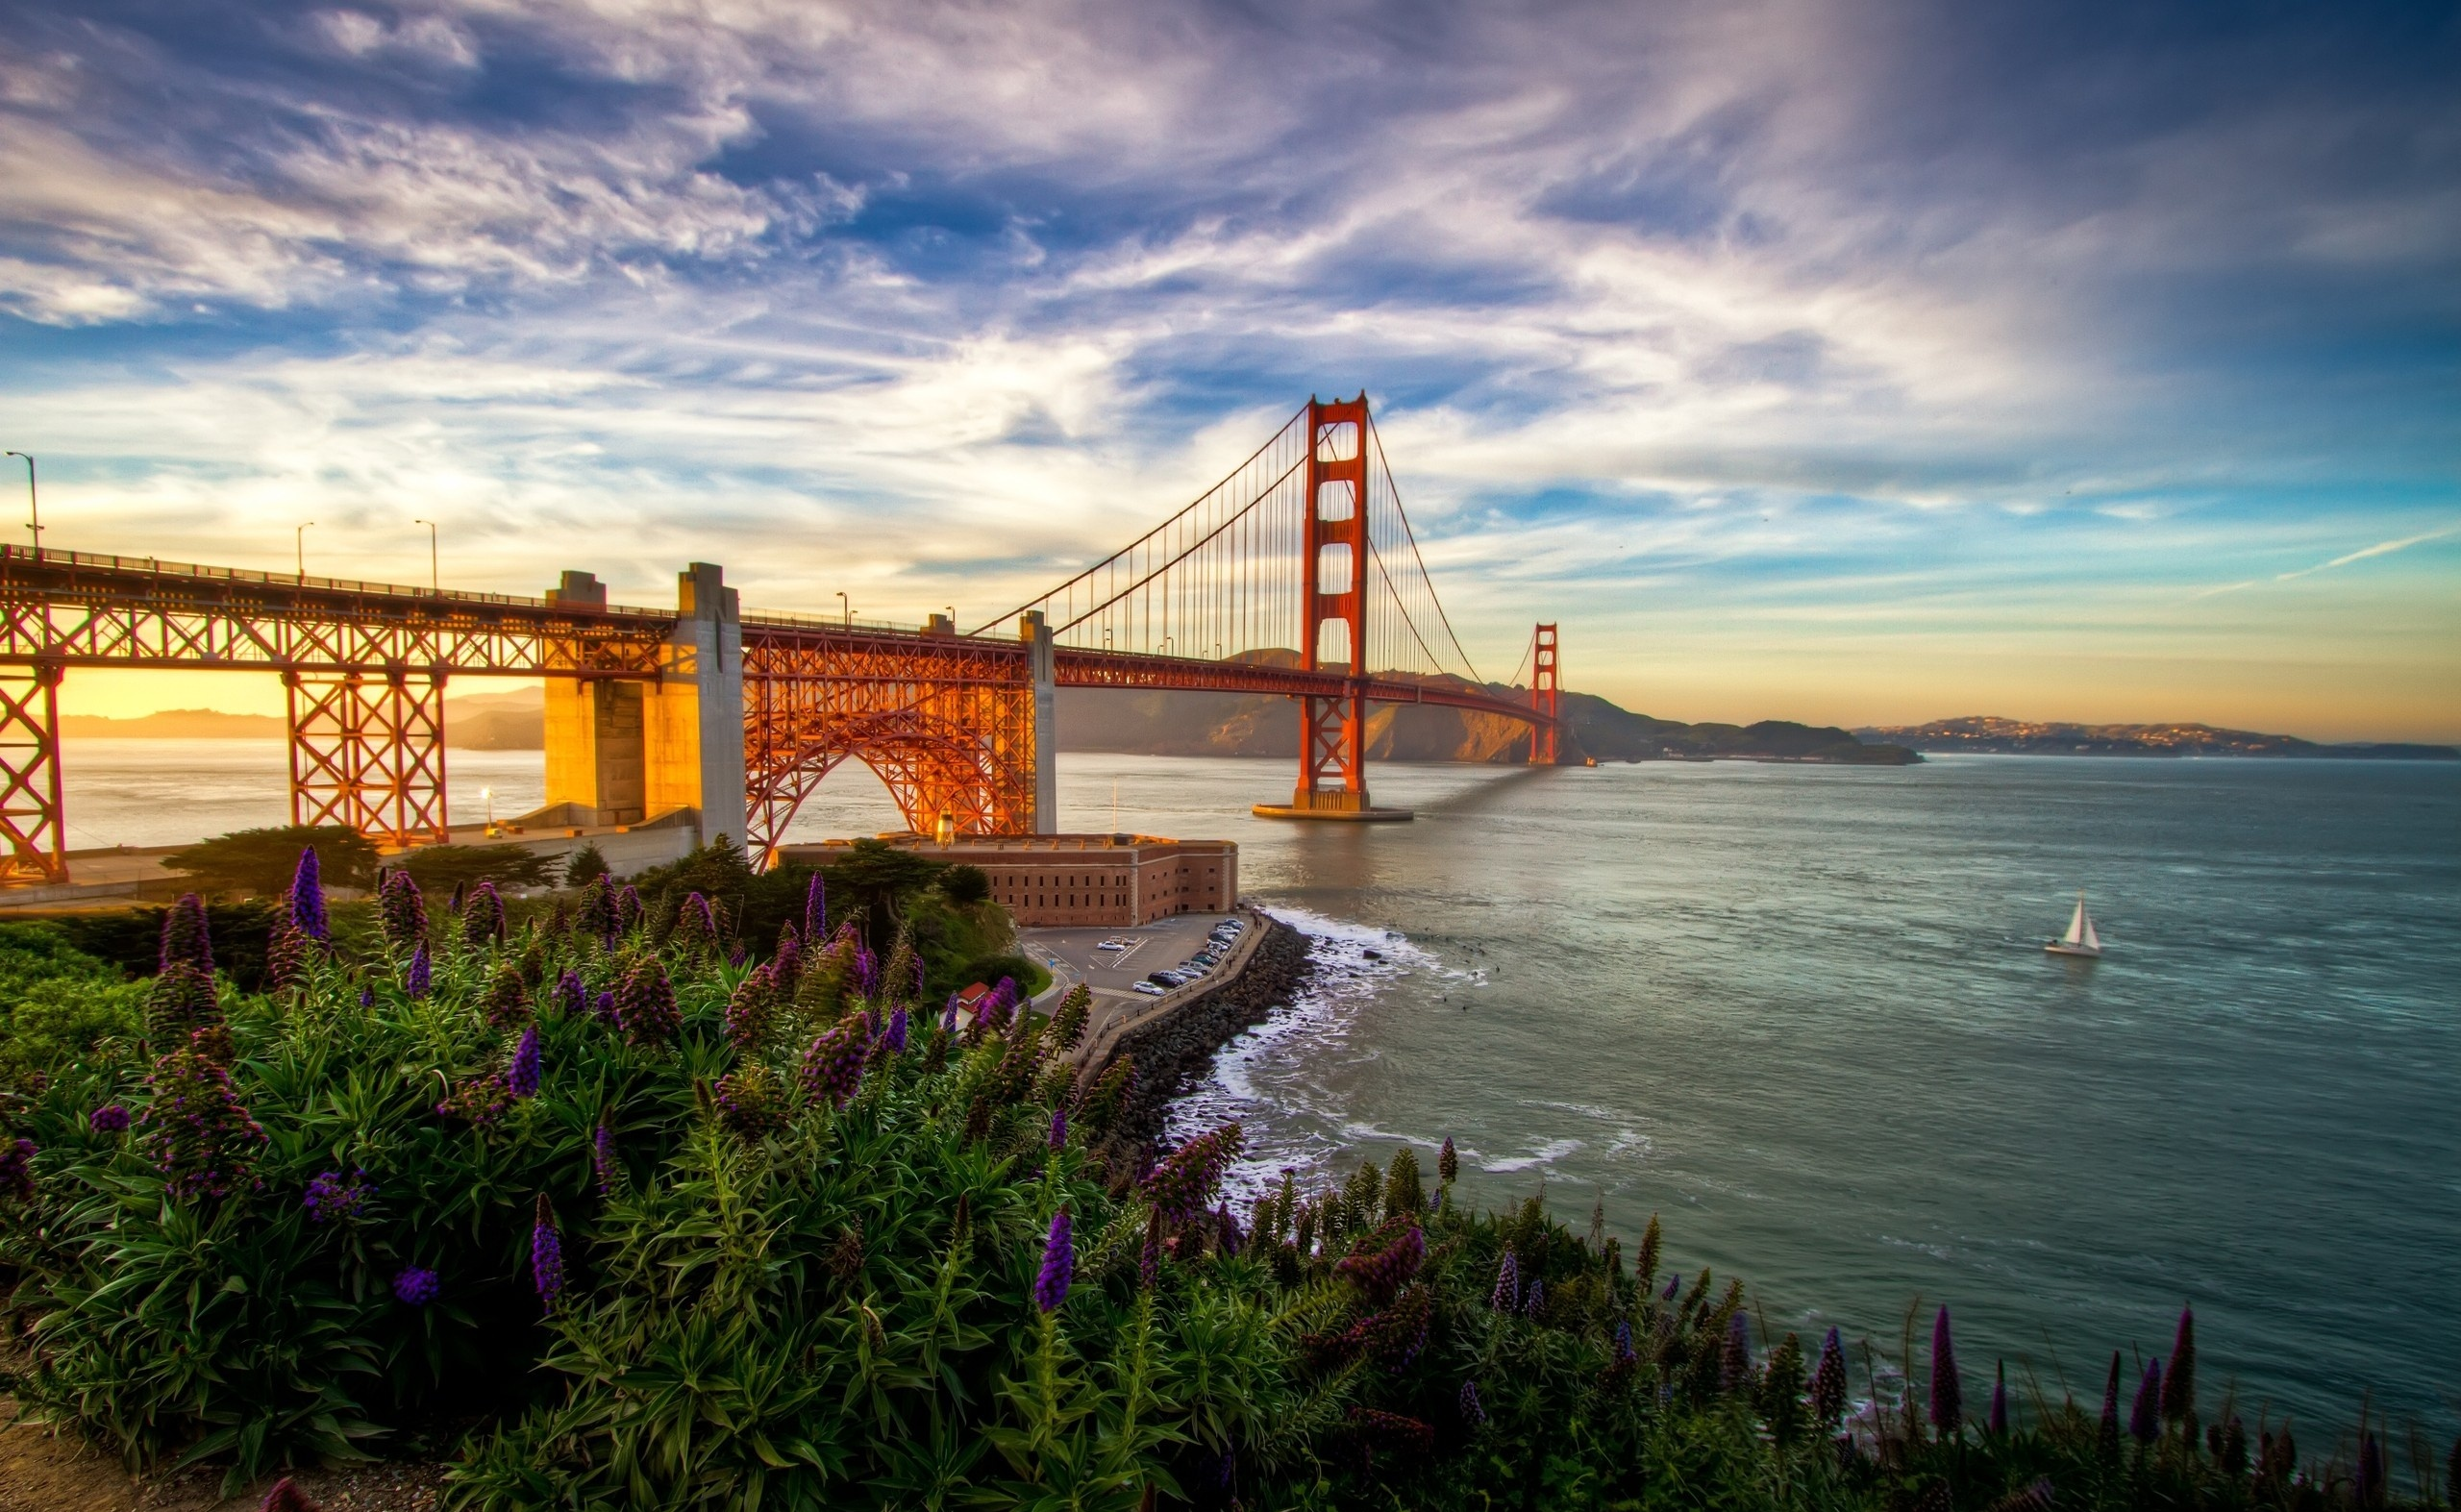 [42+] HD Wallpaper Golden Gate Bridge on WallpaperSafari